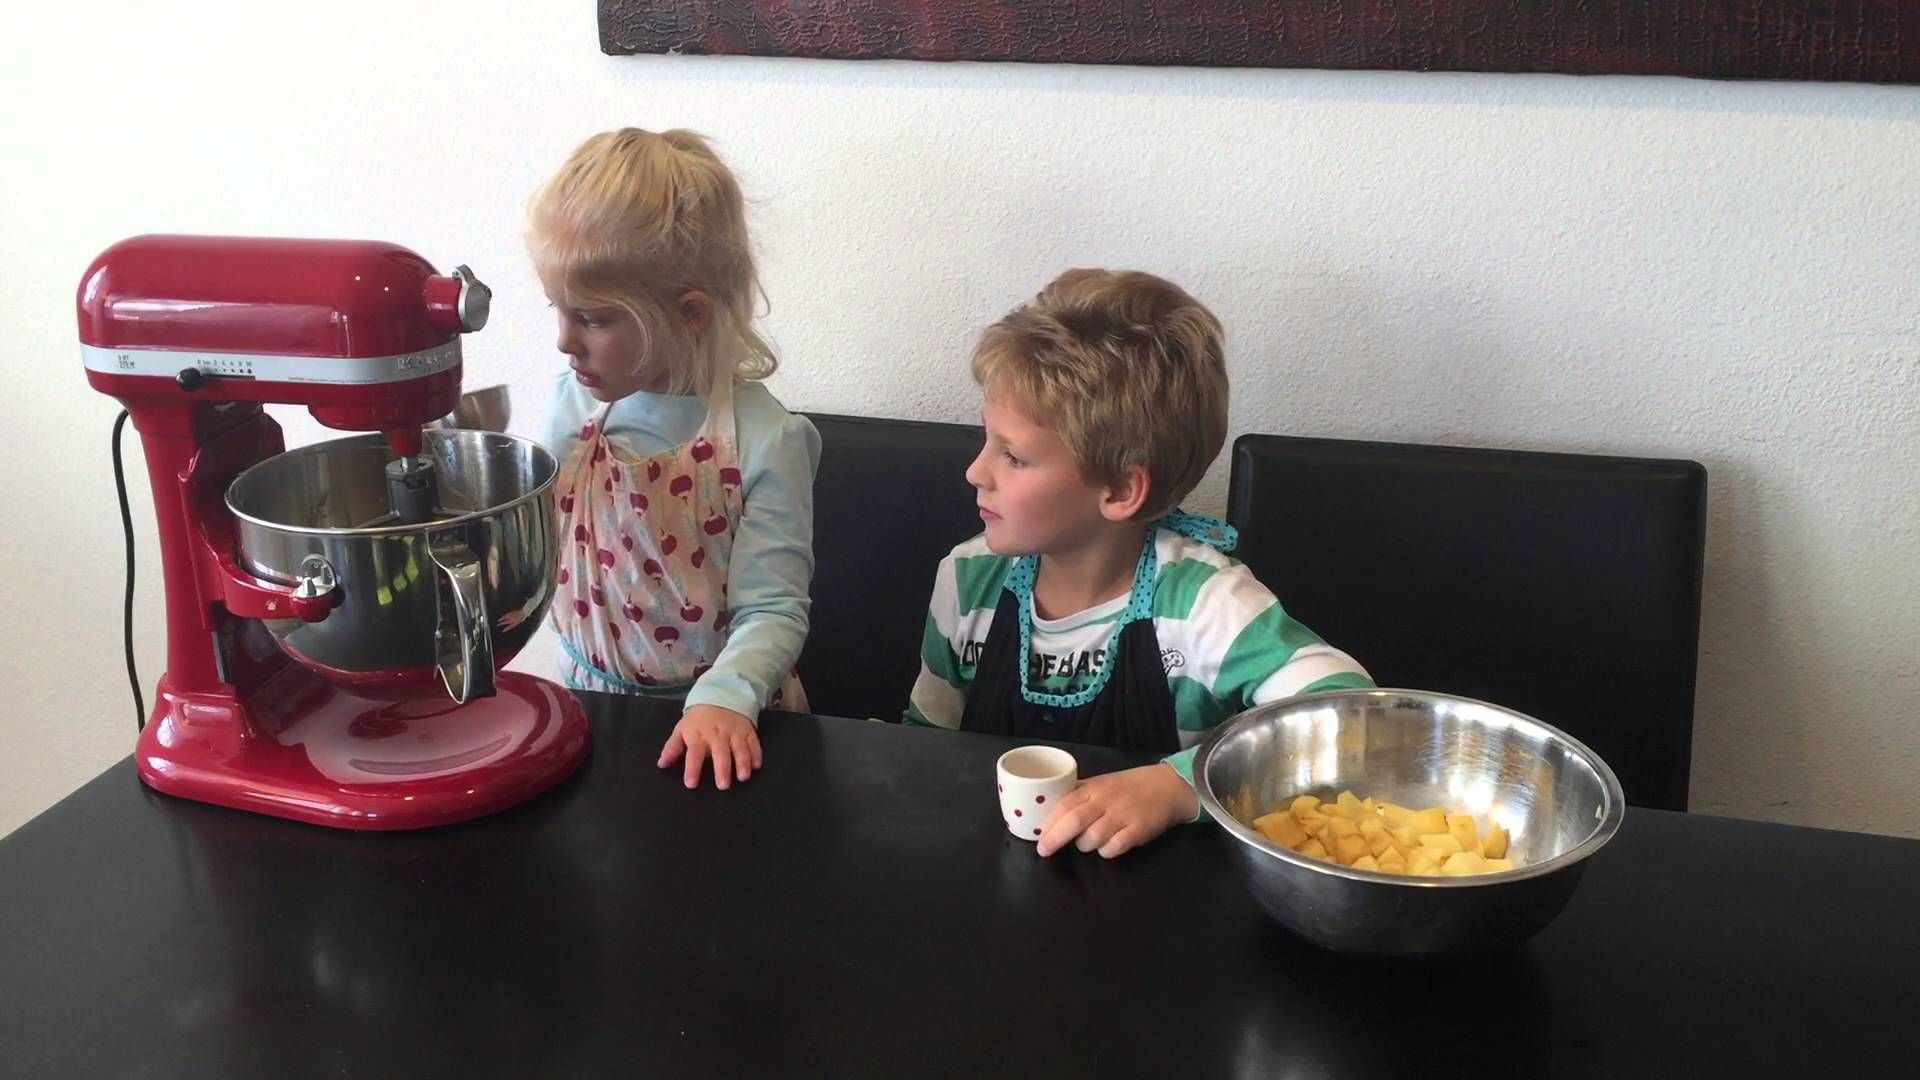 Kitchenaid Apple Cake Recipe: Pin By Gotmixer On KitchenAid Mixer Recipes